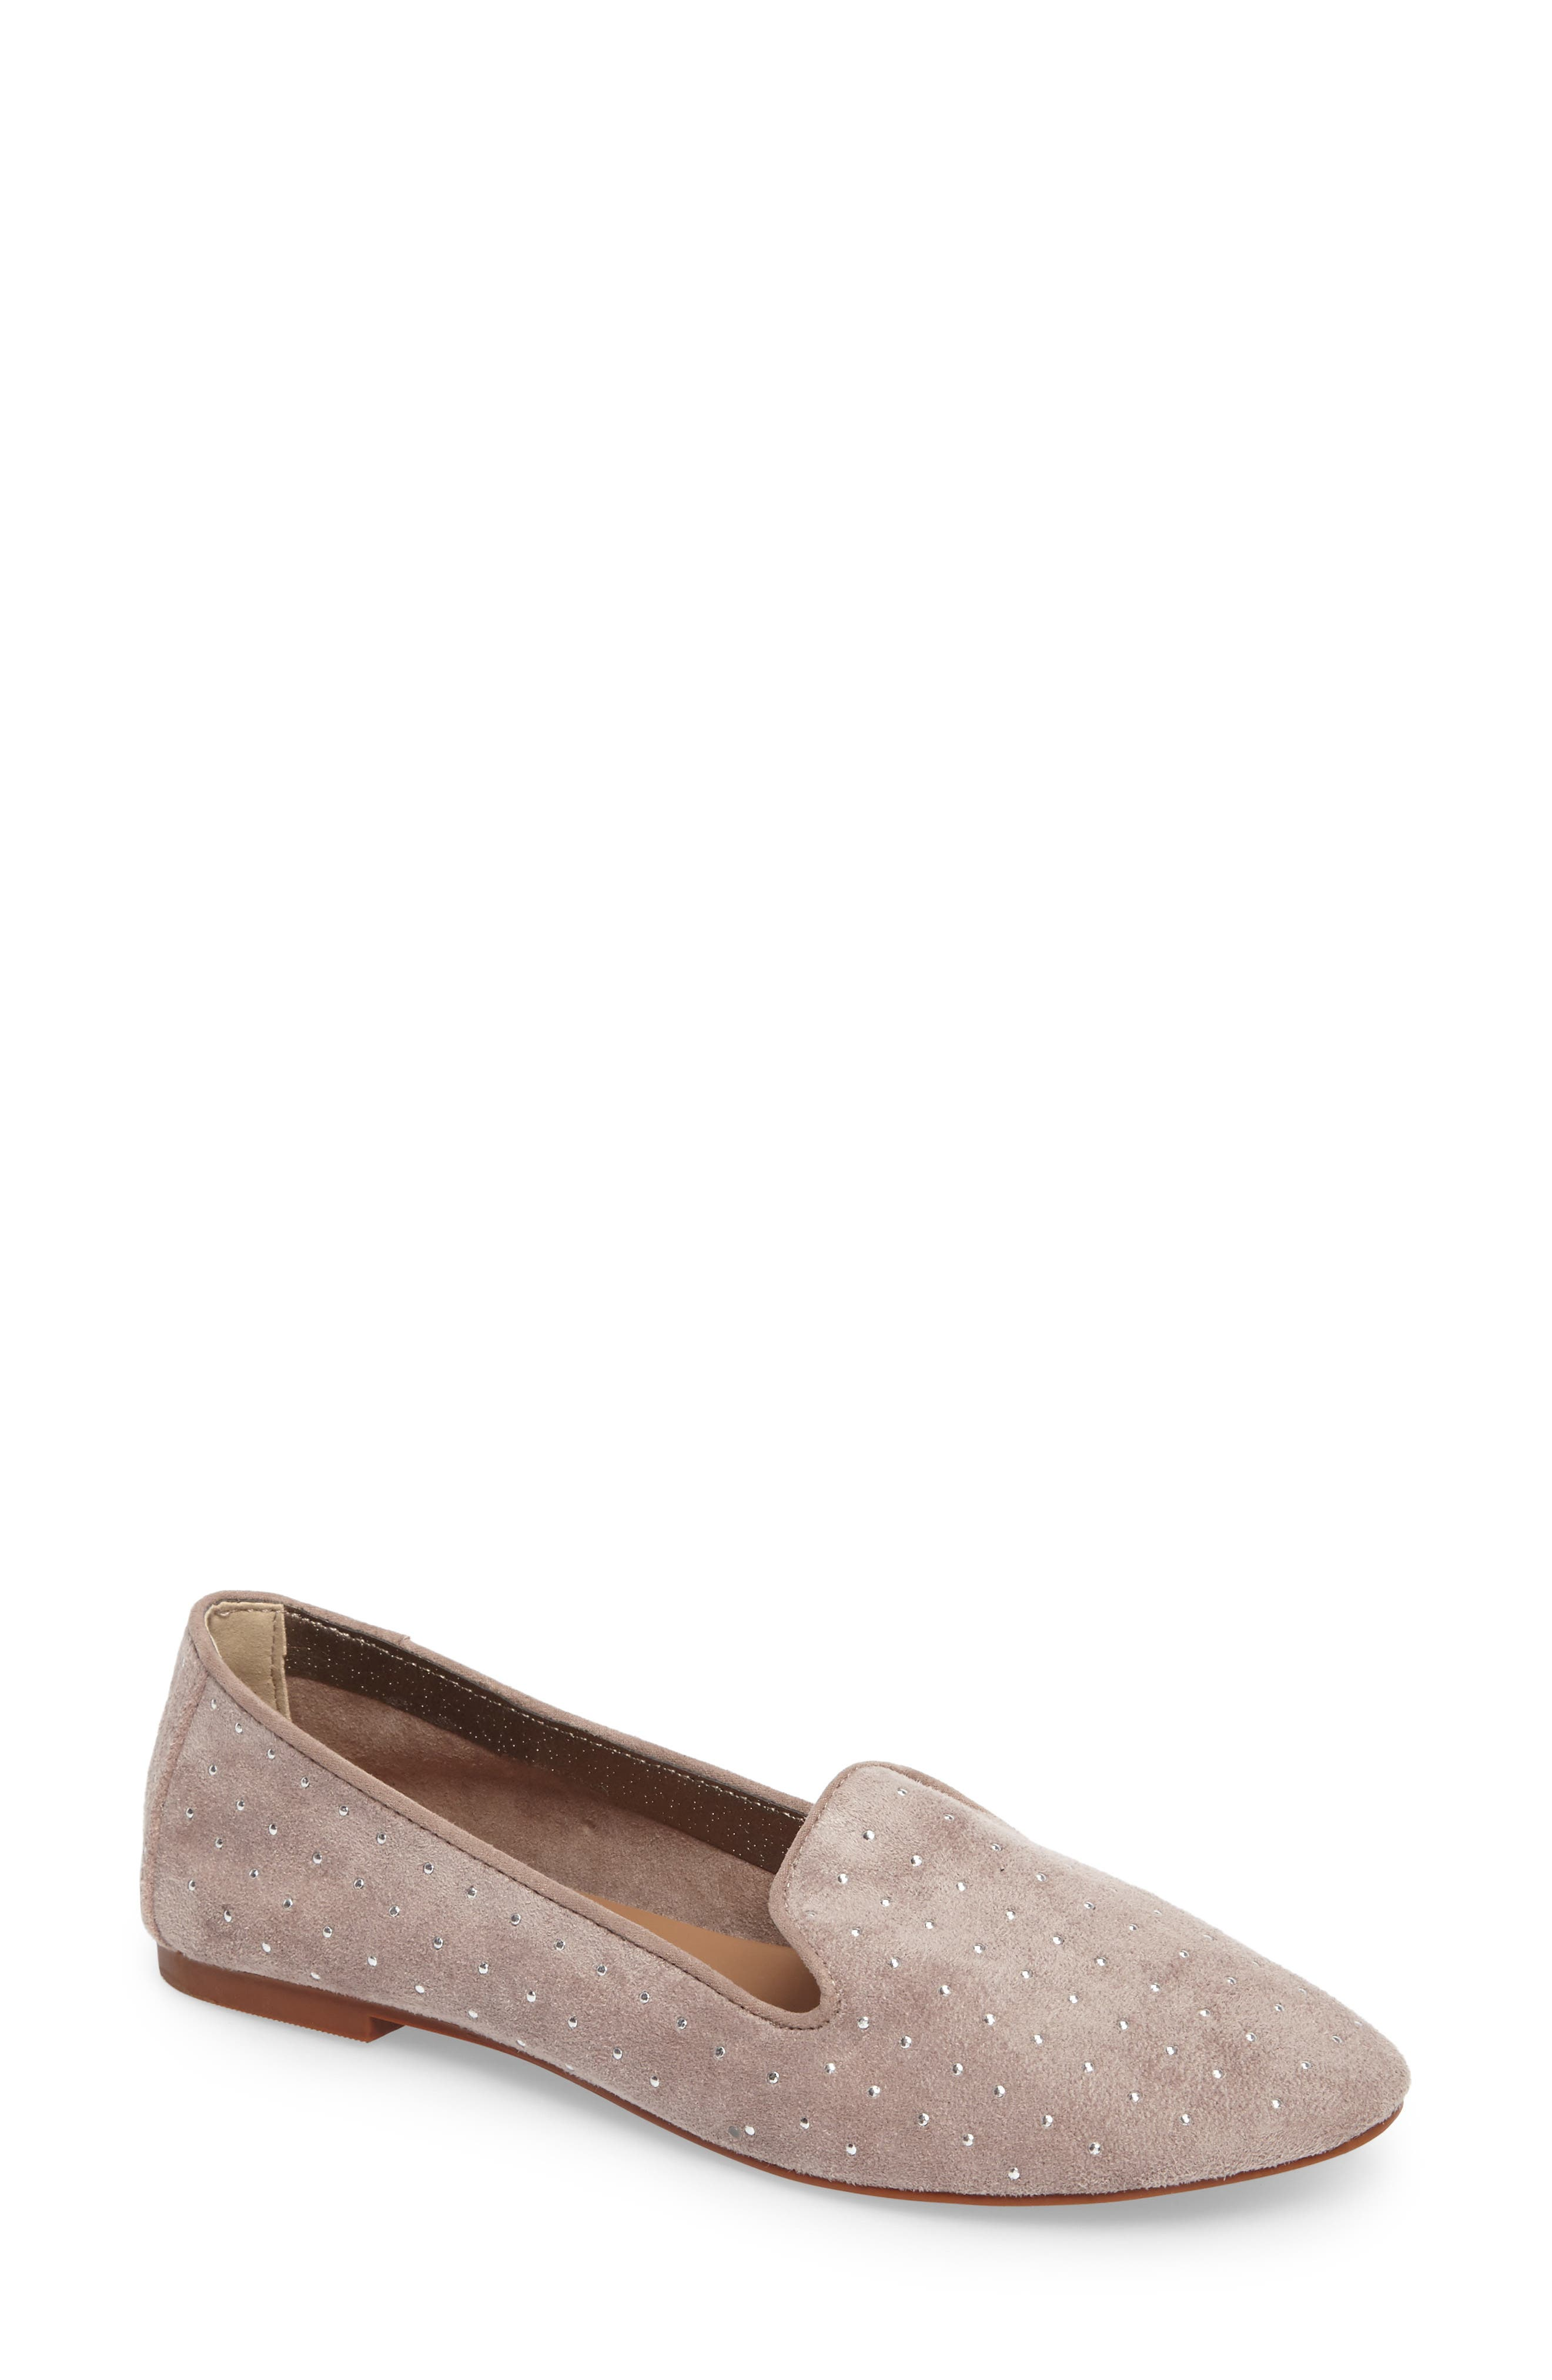 Main Image - Topshop Sophie Studded Slip-On Loafers